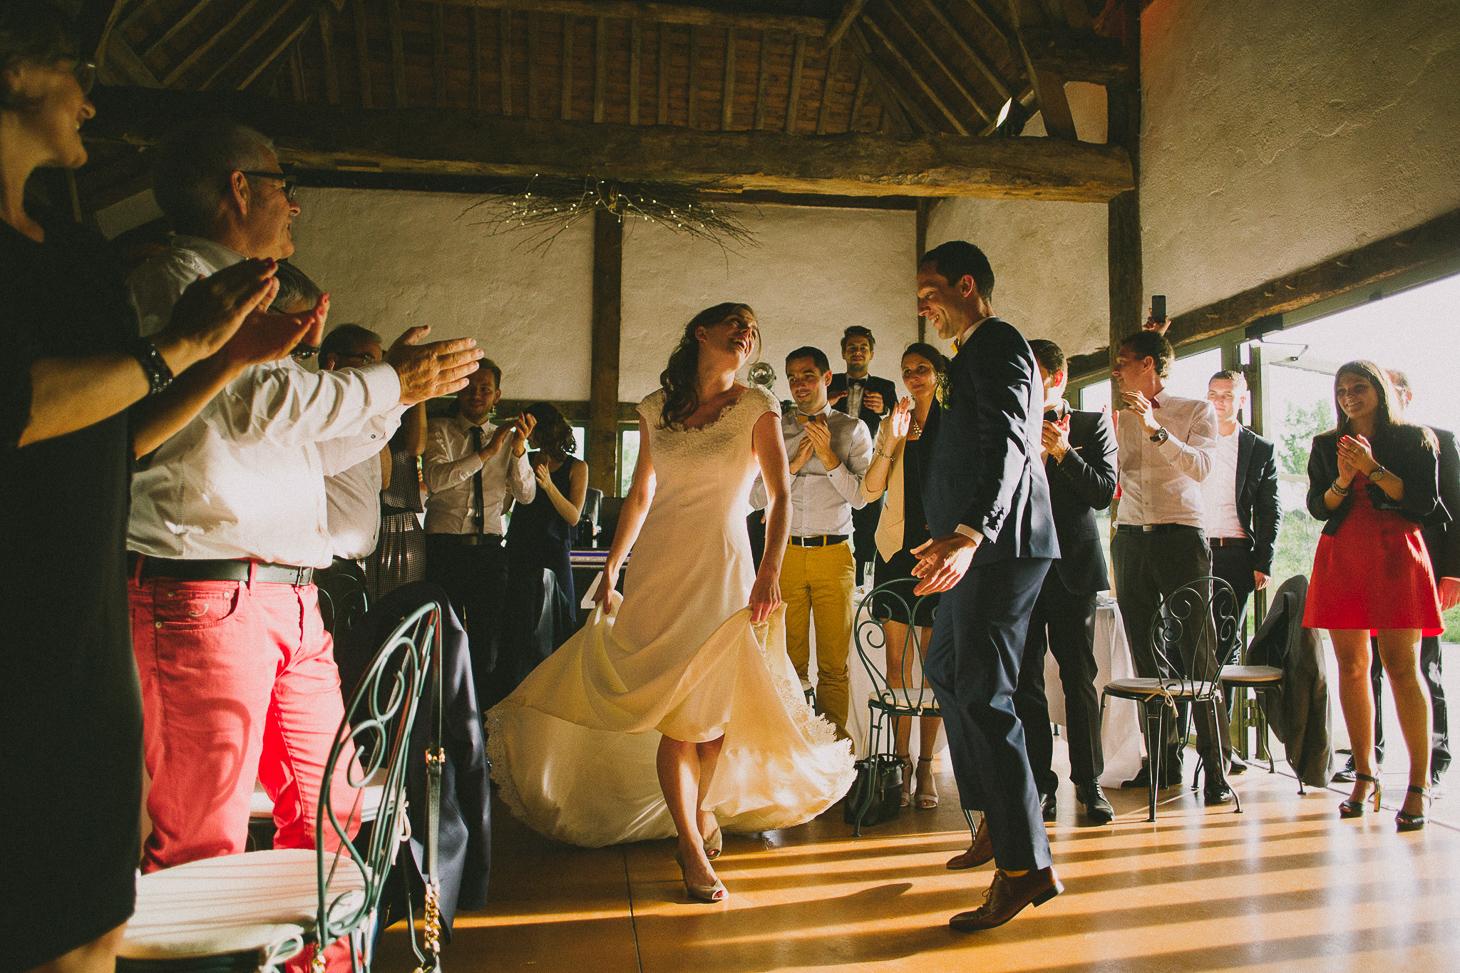 photographe-mariage-champ-de-launay-normandie-00072